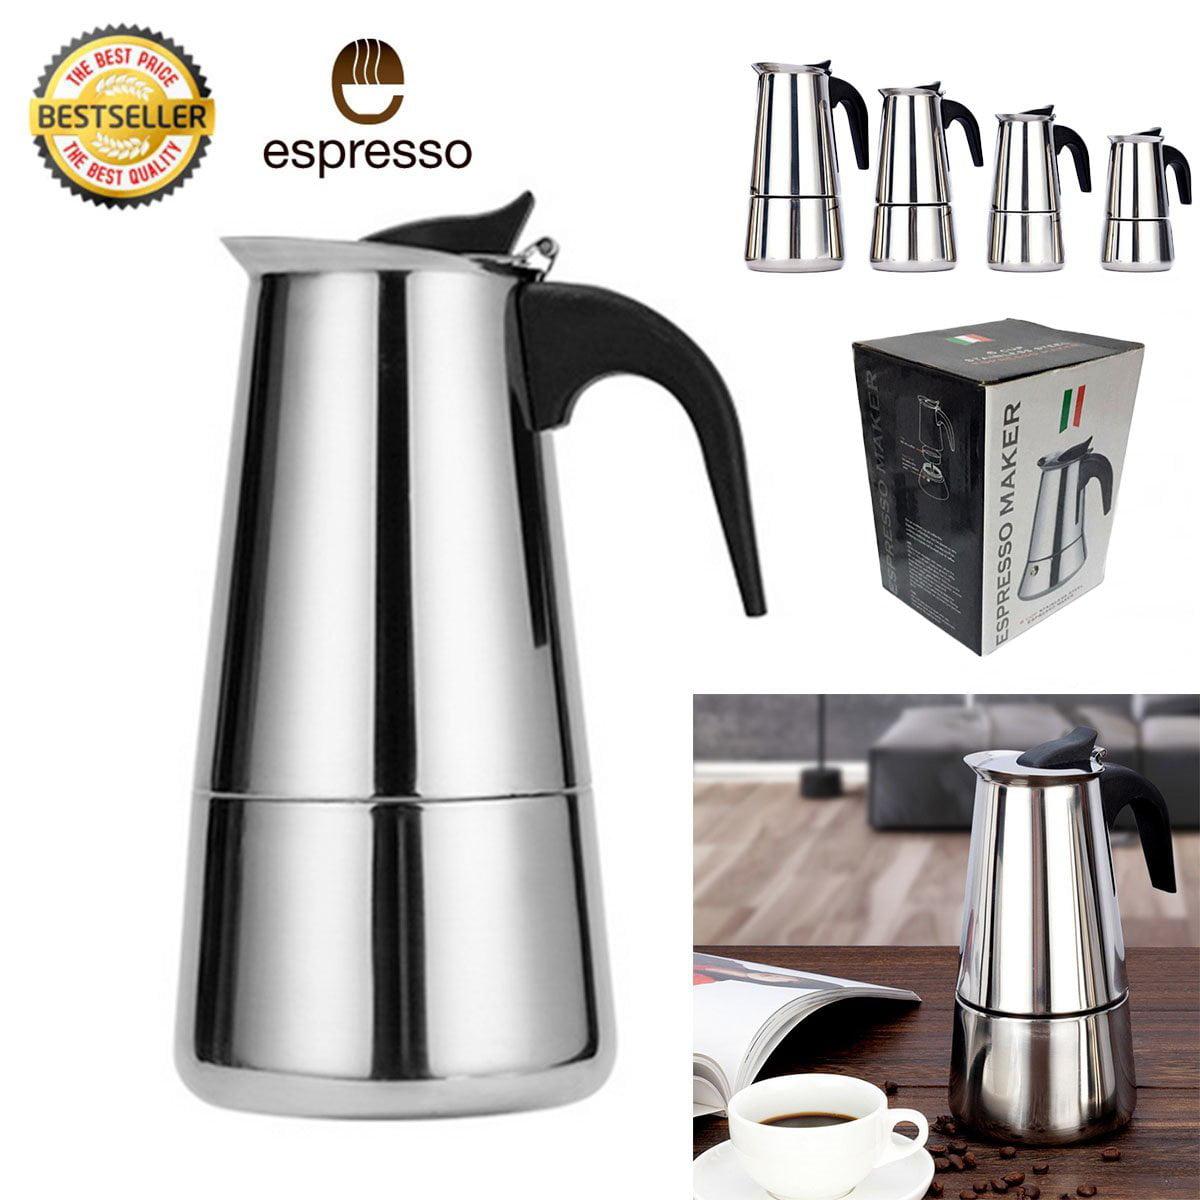 Stainless Steel Italian Espresso Coffee